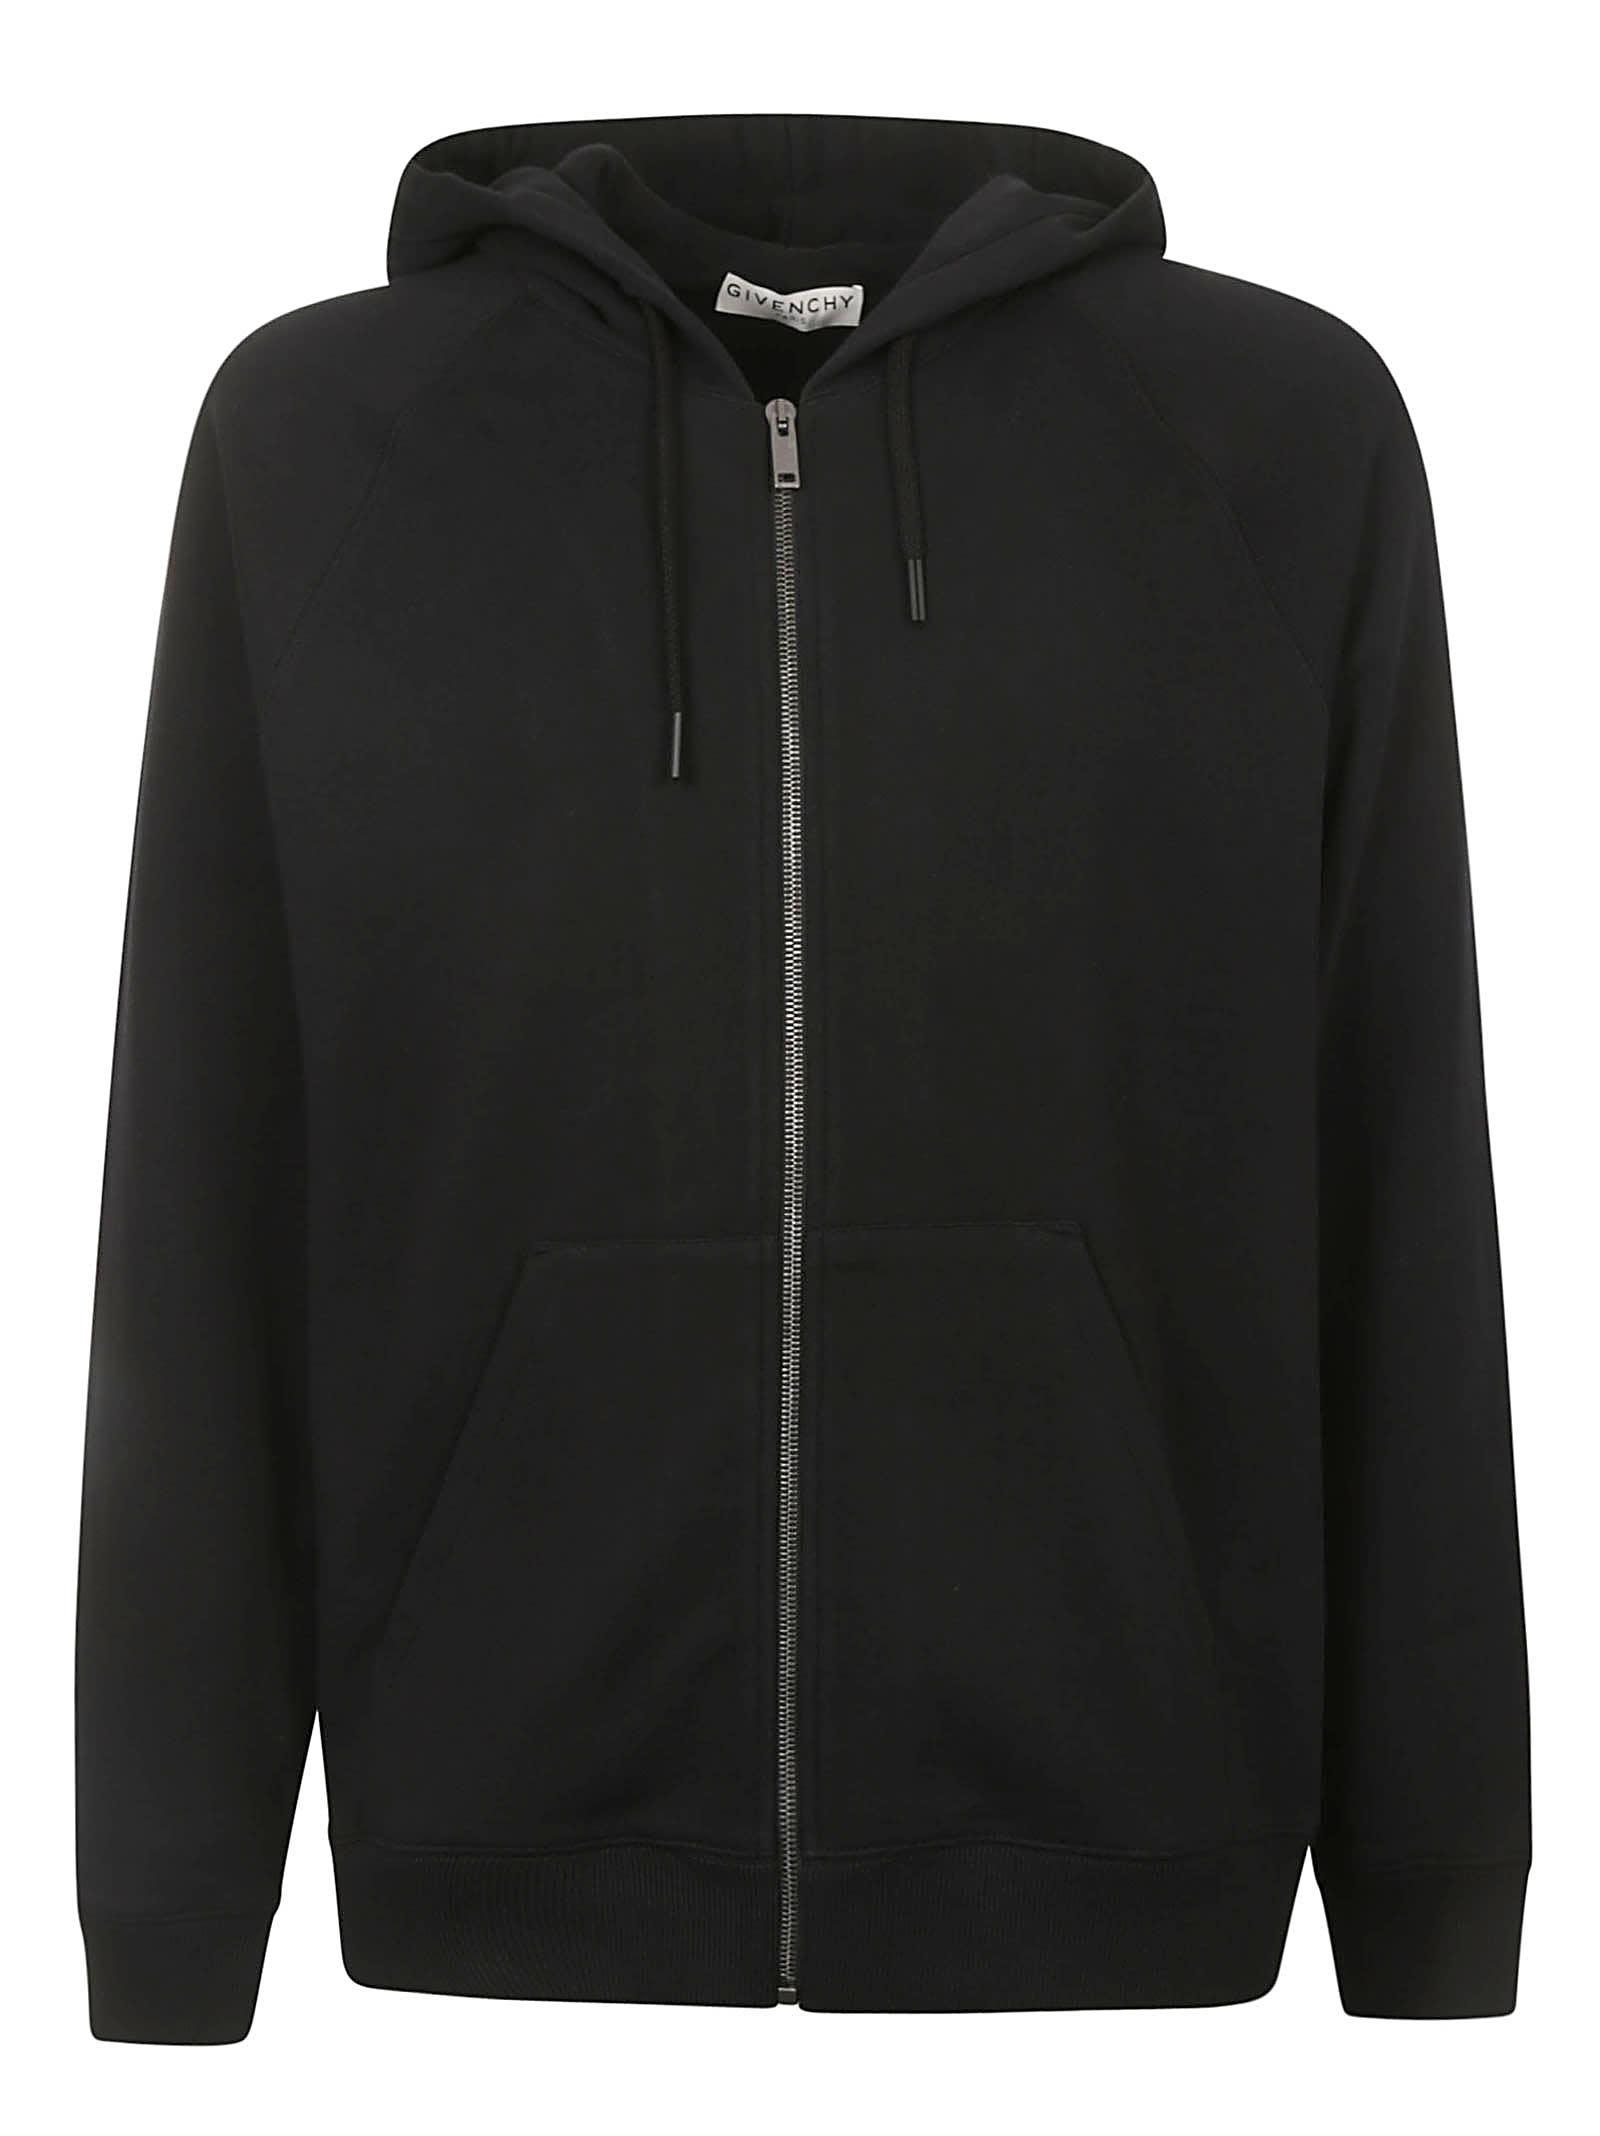 Givenchy Rear Logo Print Zipped Hoodie